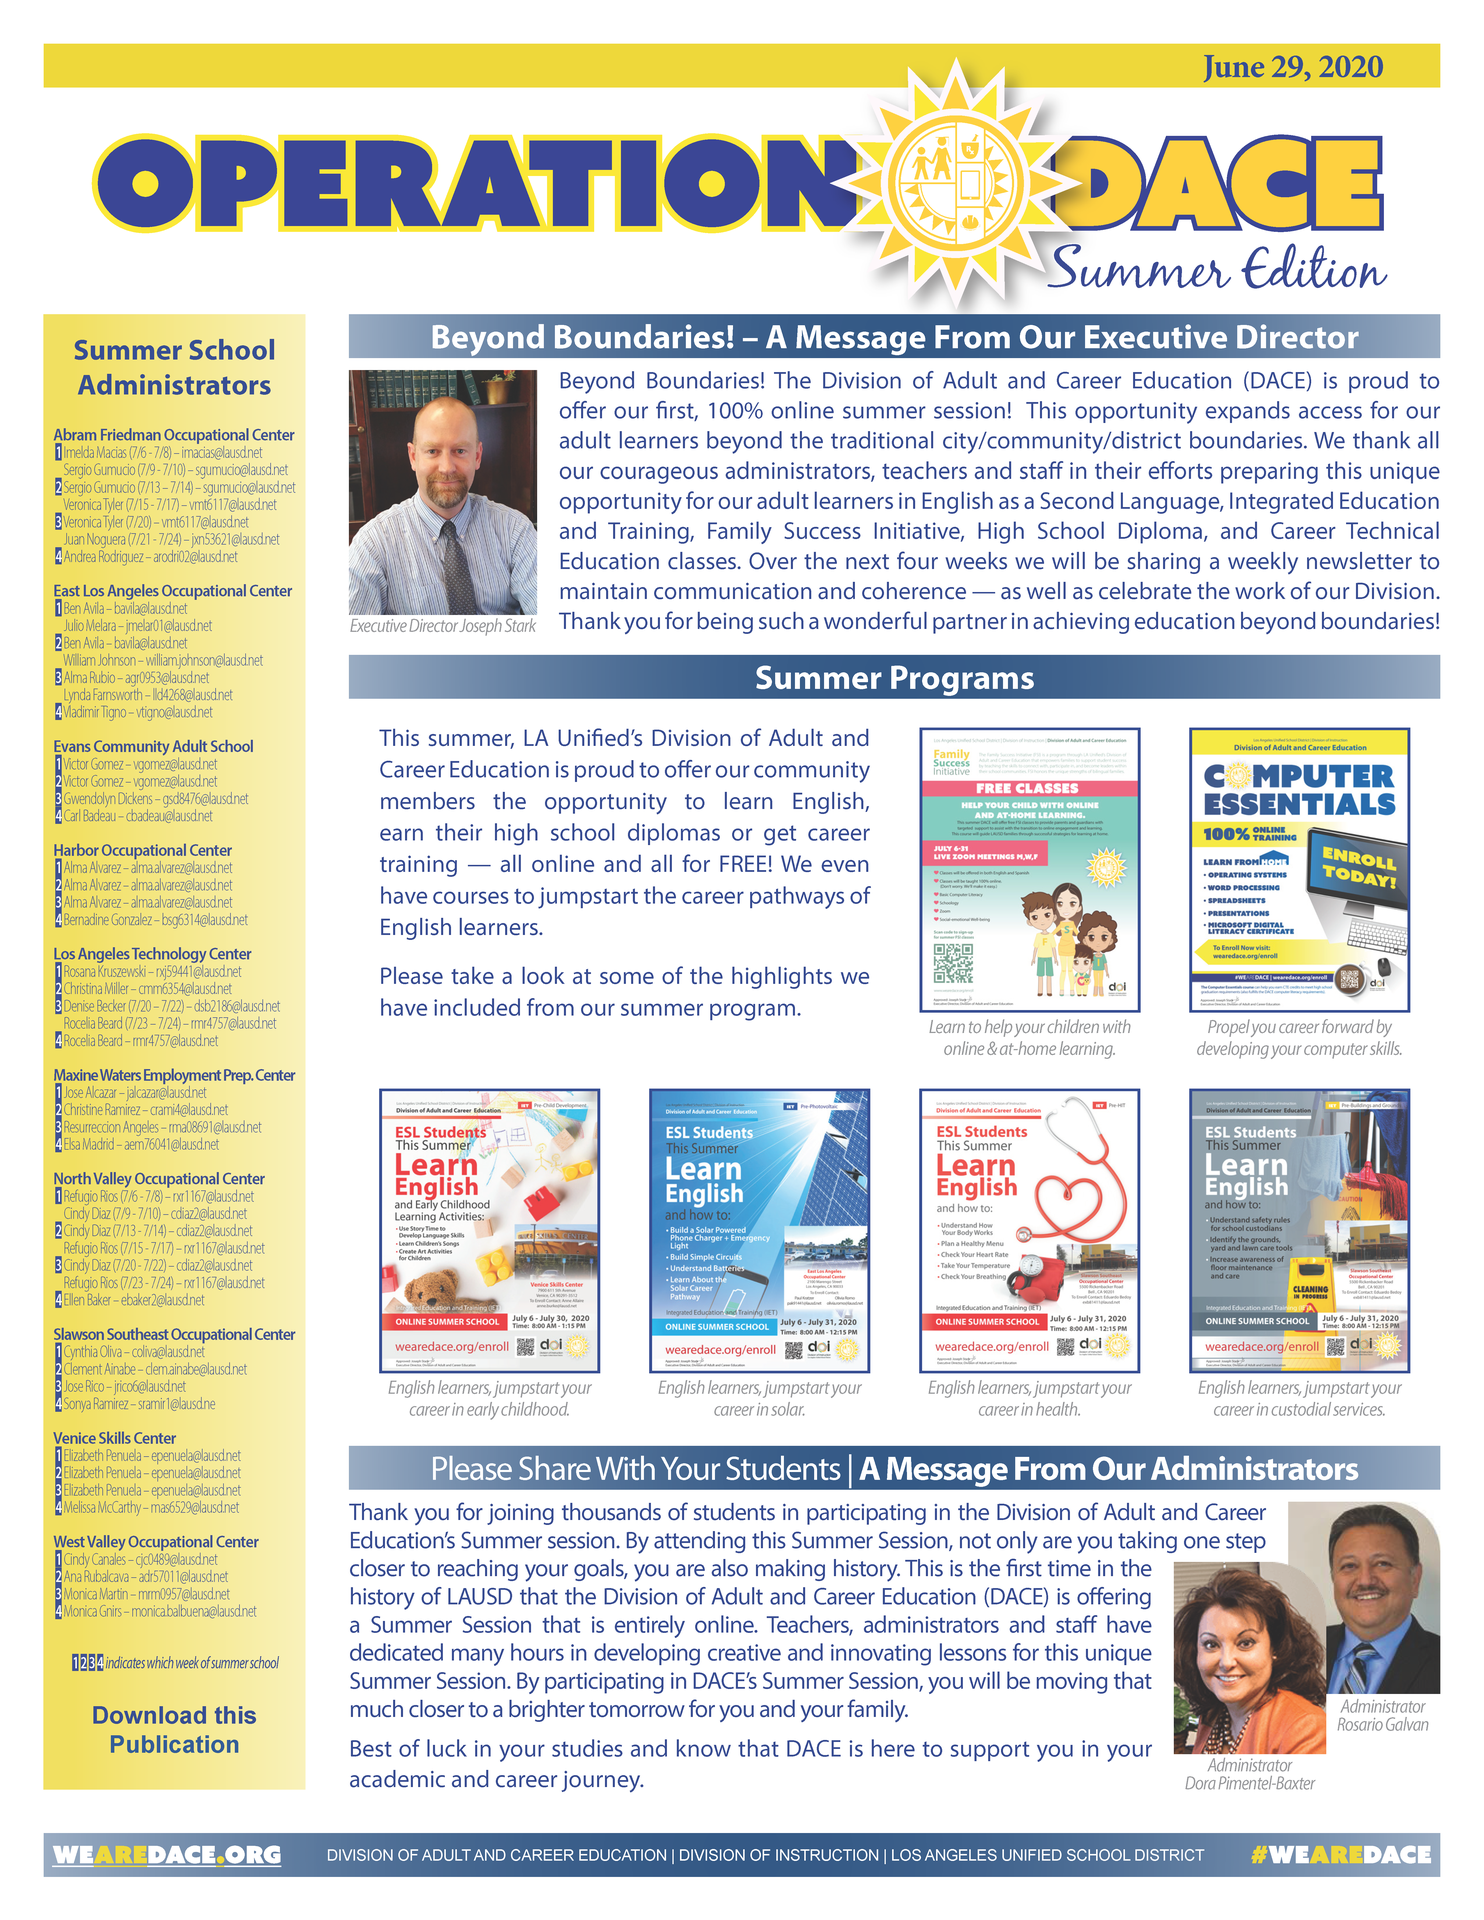 DACE Summer Newsletter - June 29, 2020 Thumbnail